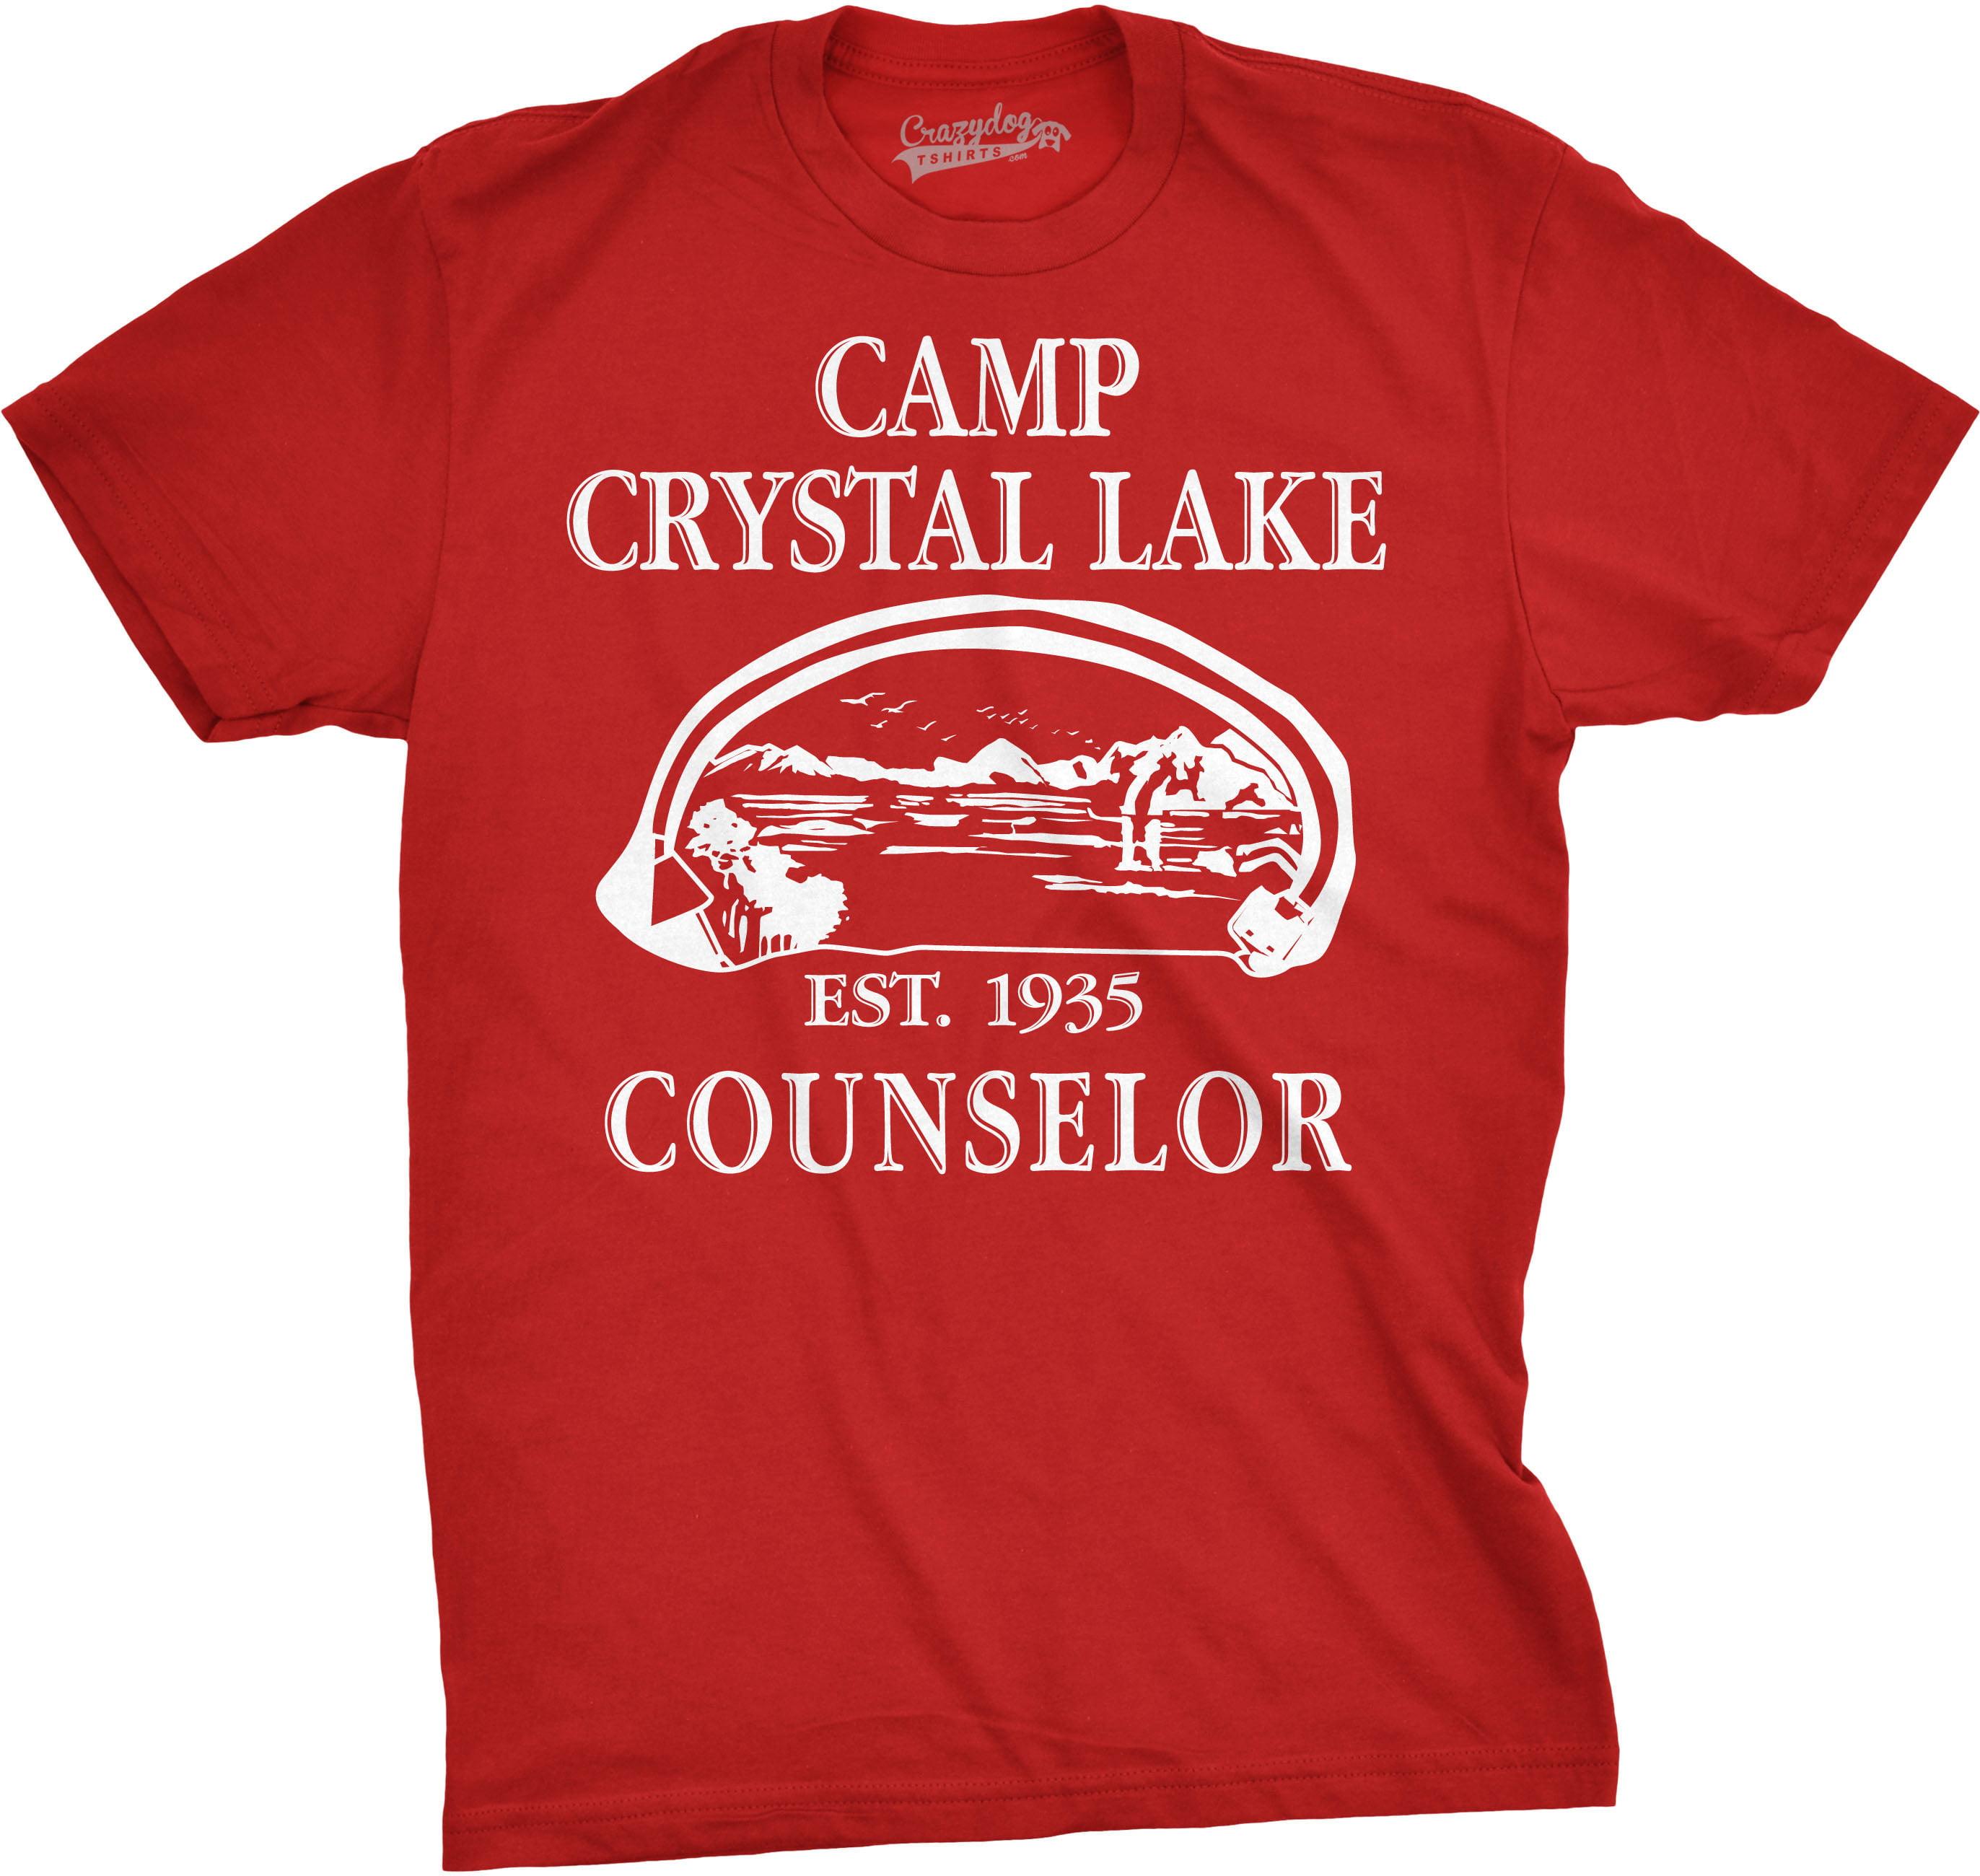 Camp Camping Crystal Lake Counselor Vintage Design Sweatshirt